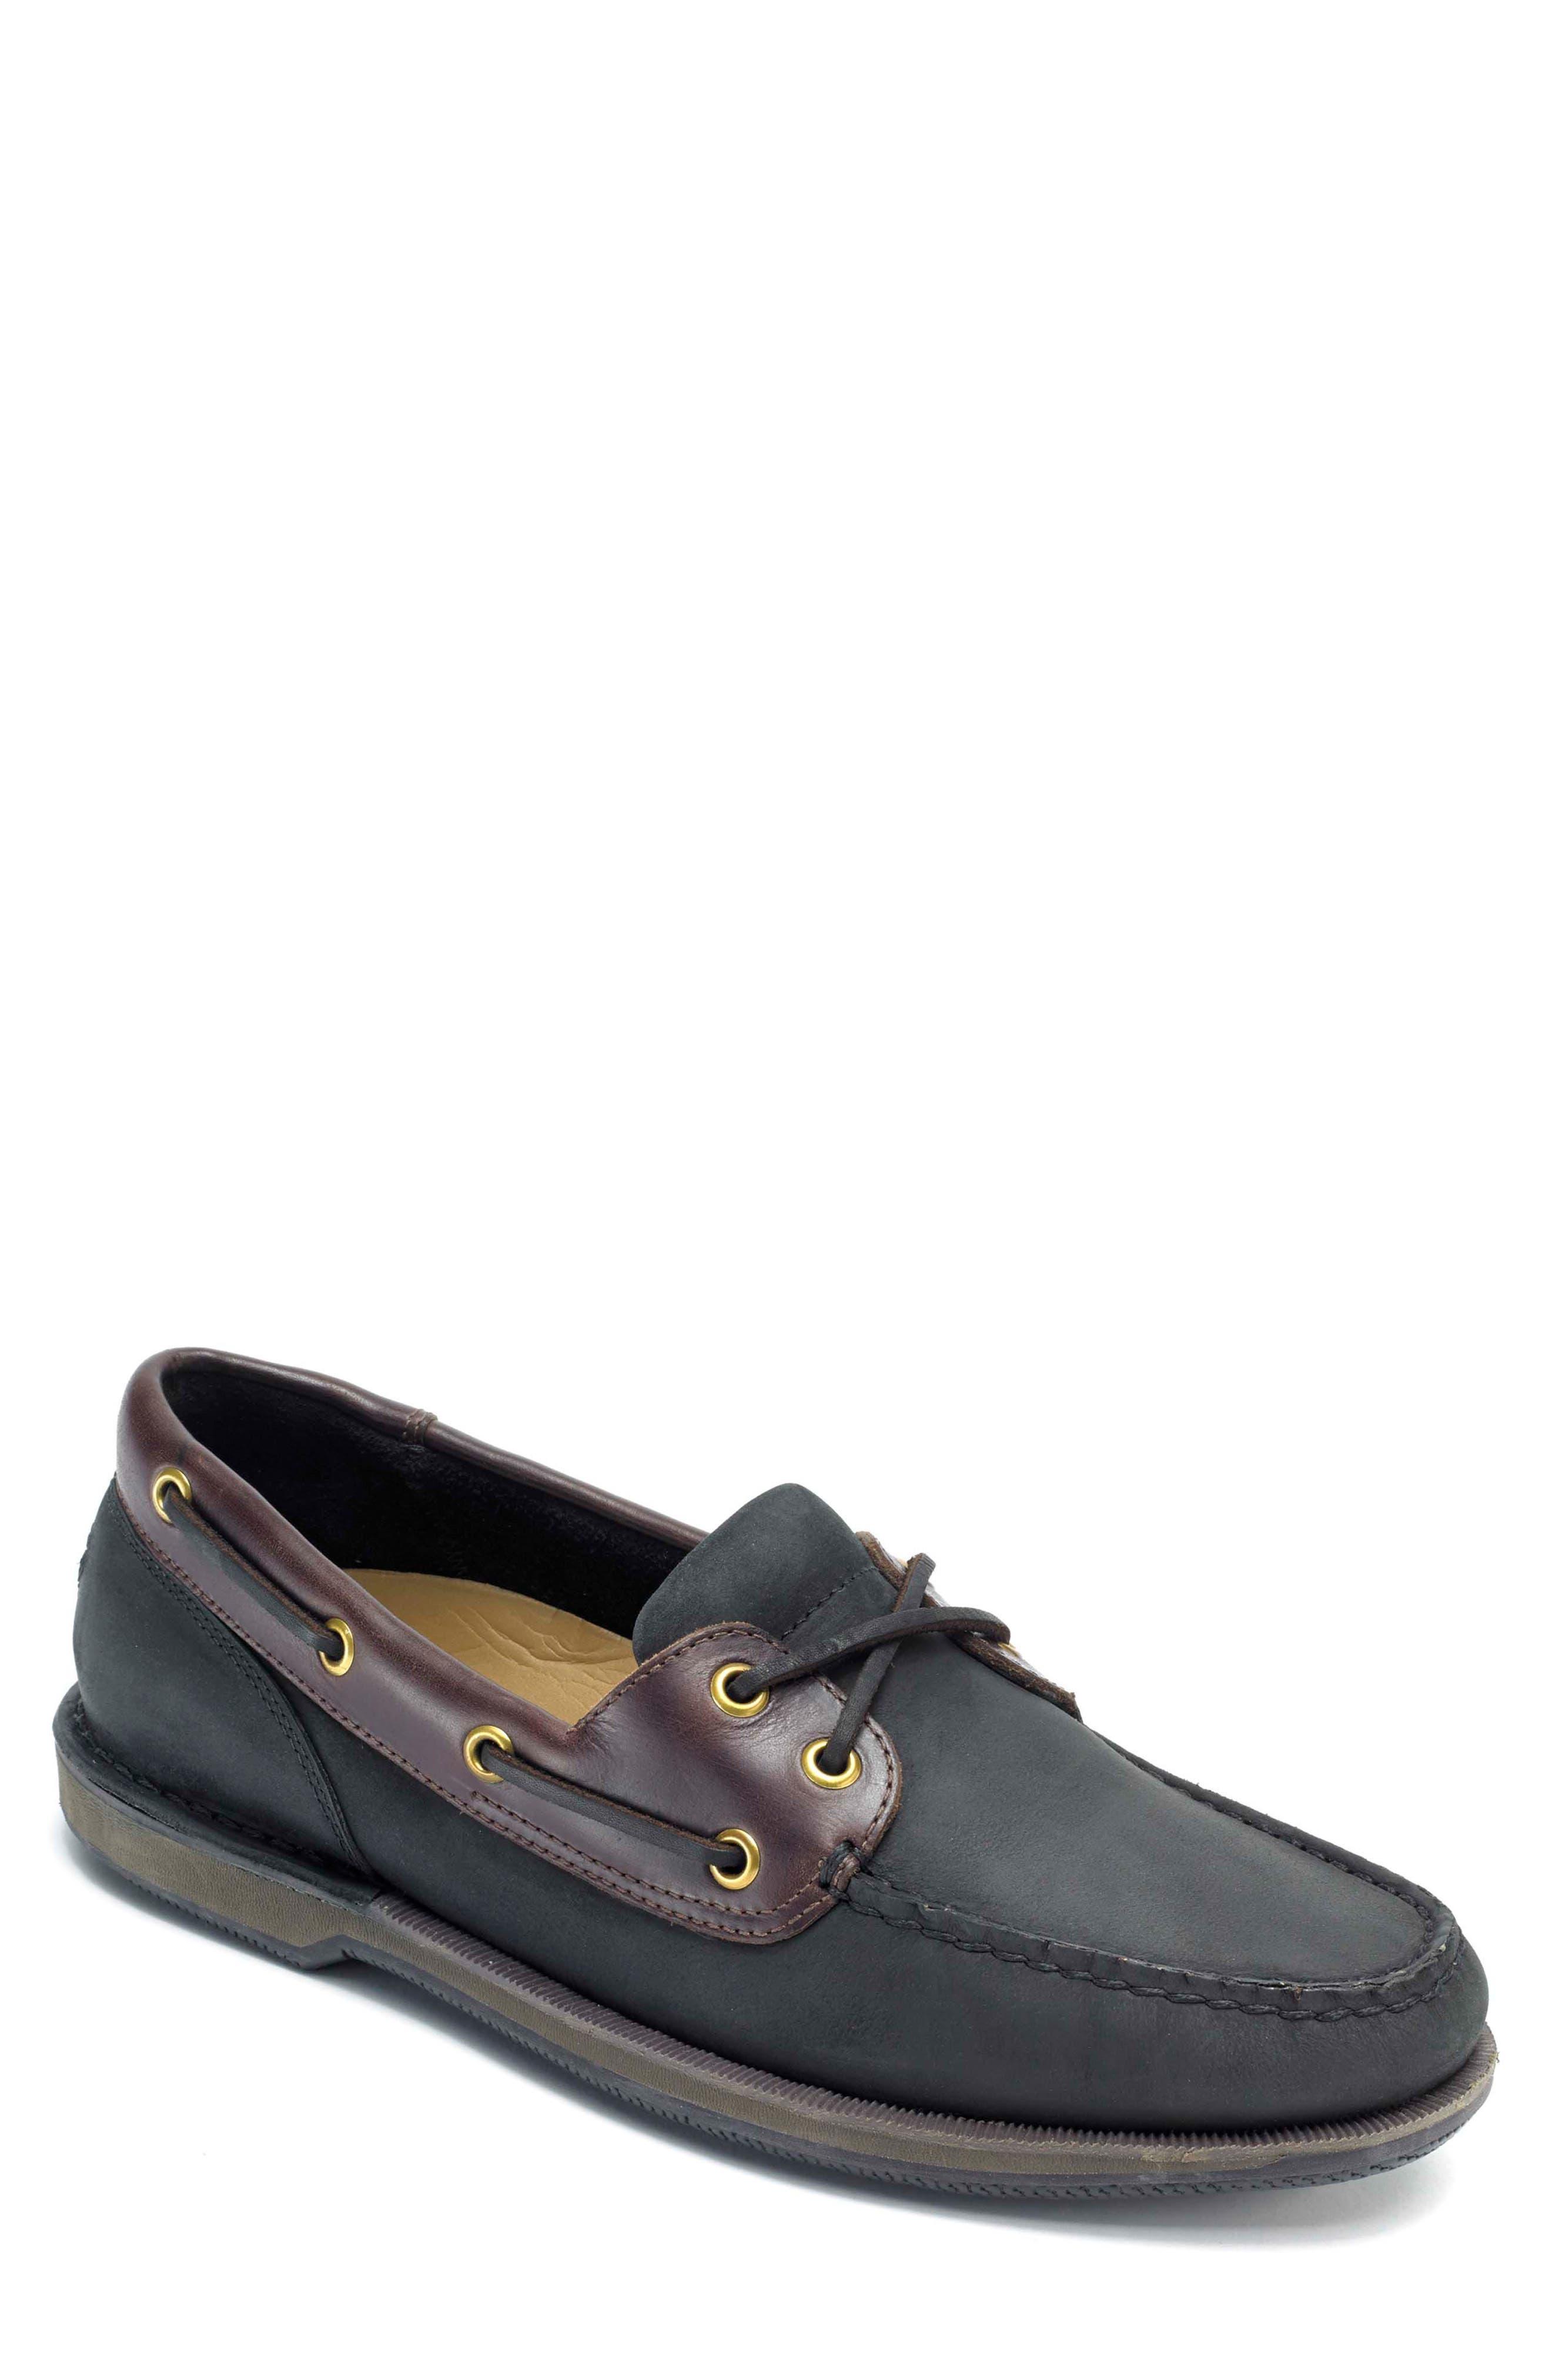 'Perth' Boat Shoe,                         Main,                         color, Black/ Bark Leather